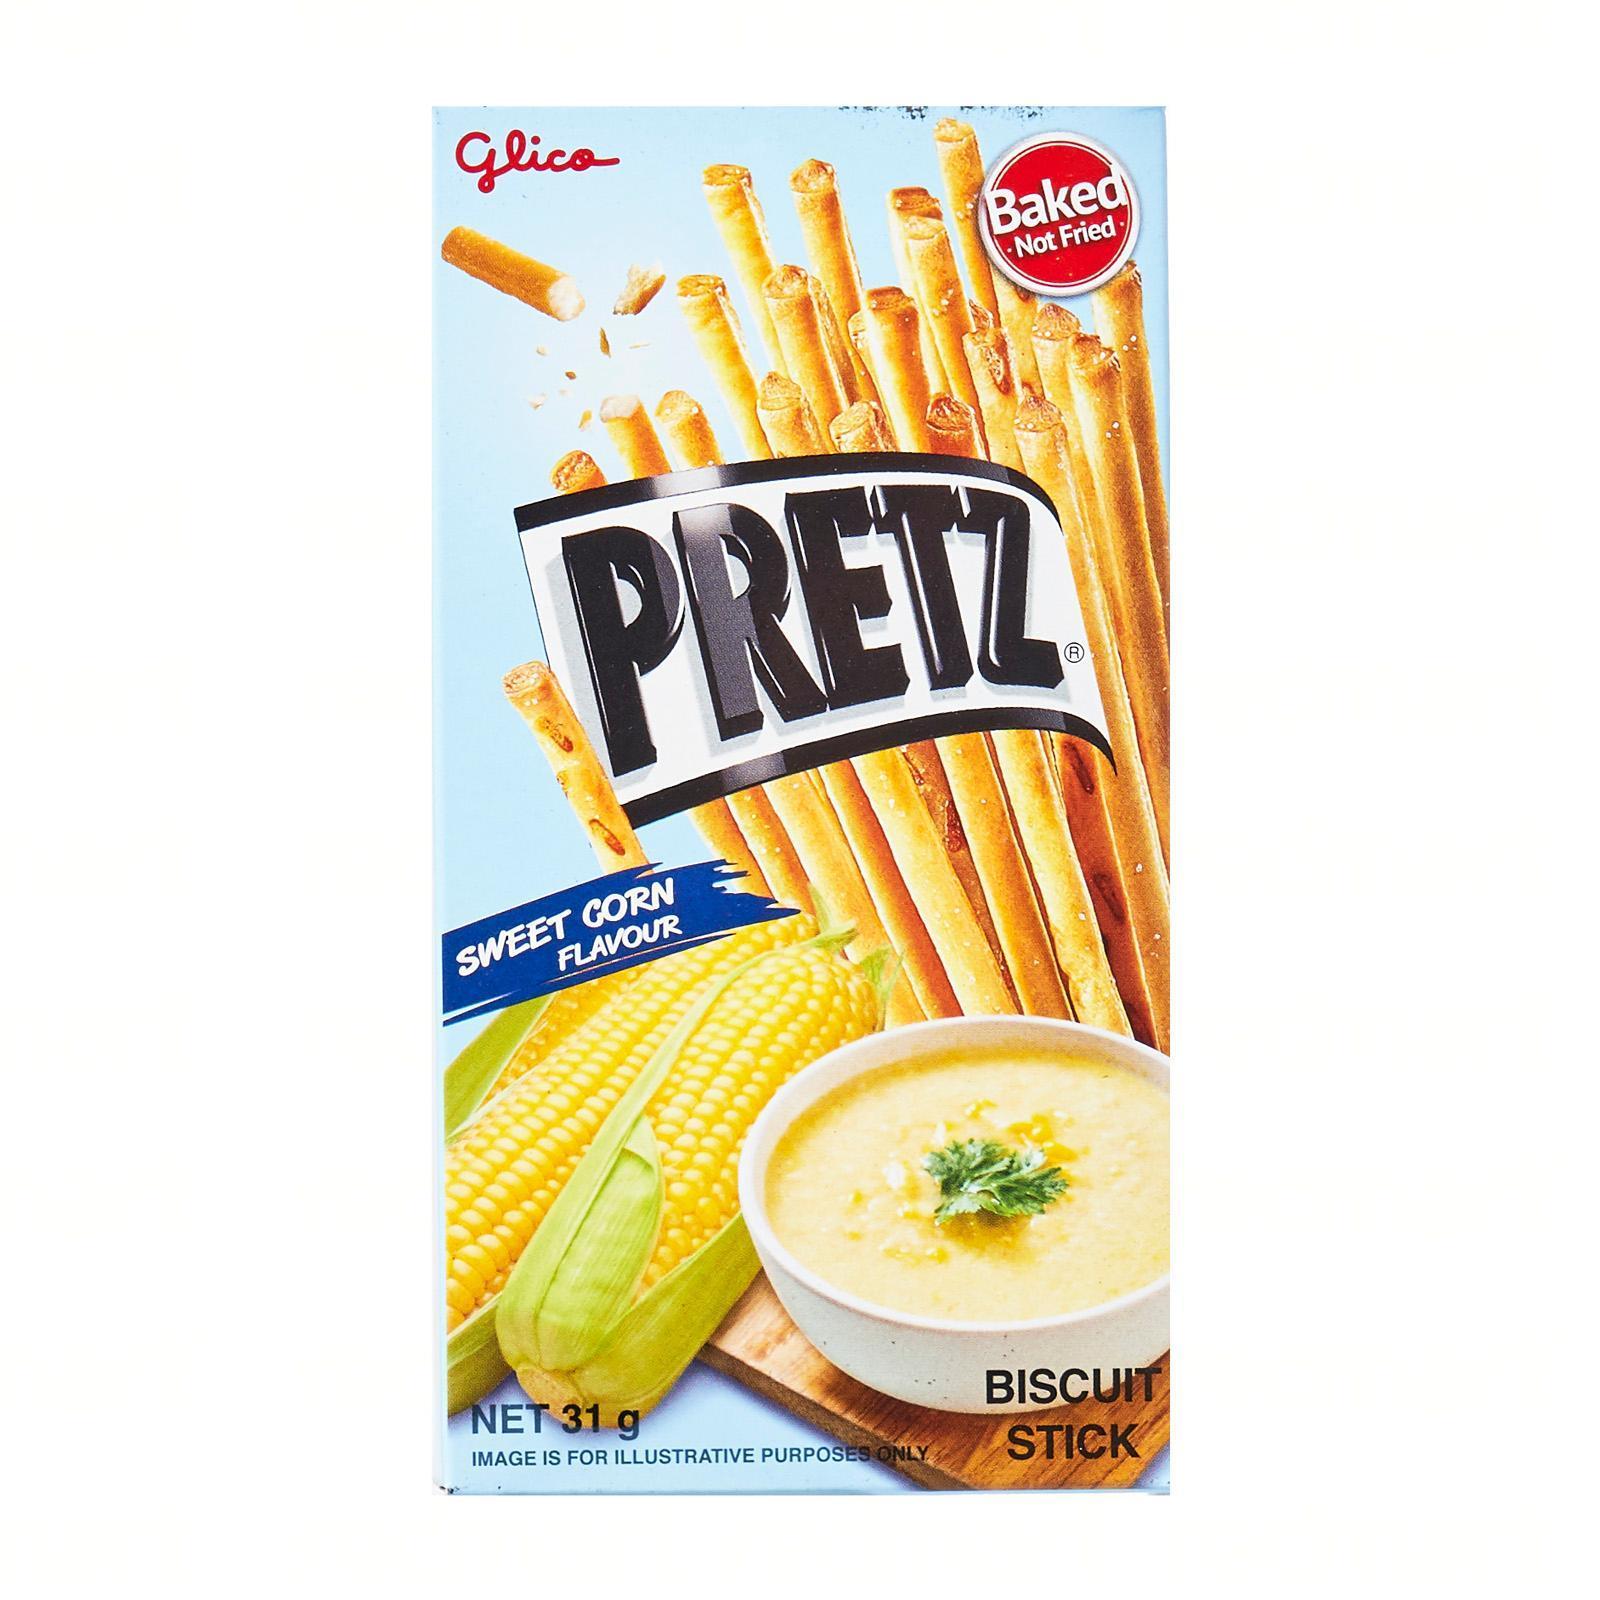 PRETZ Sweet Corn Biscuit Stick